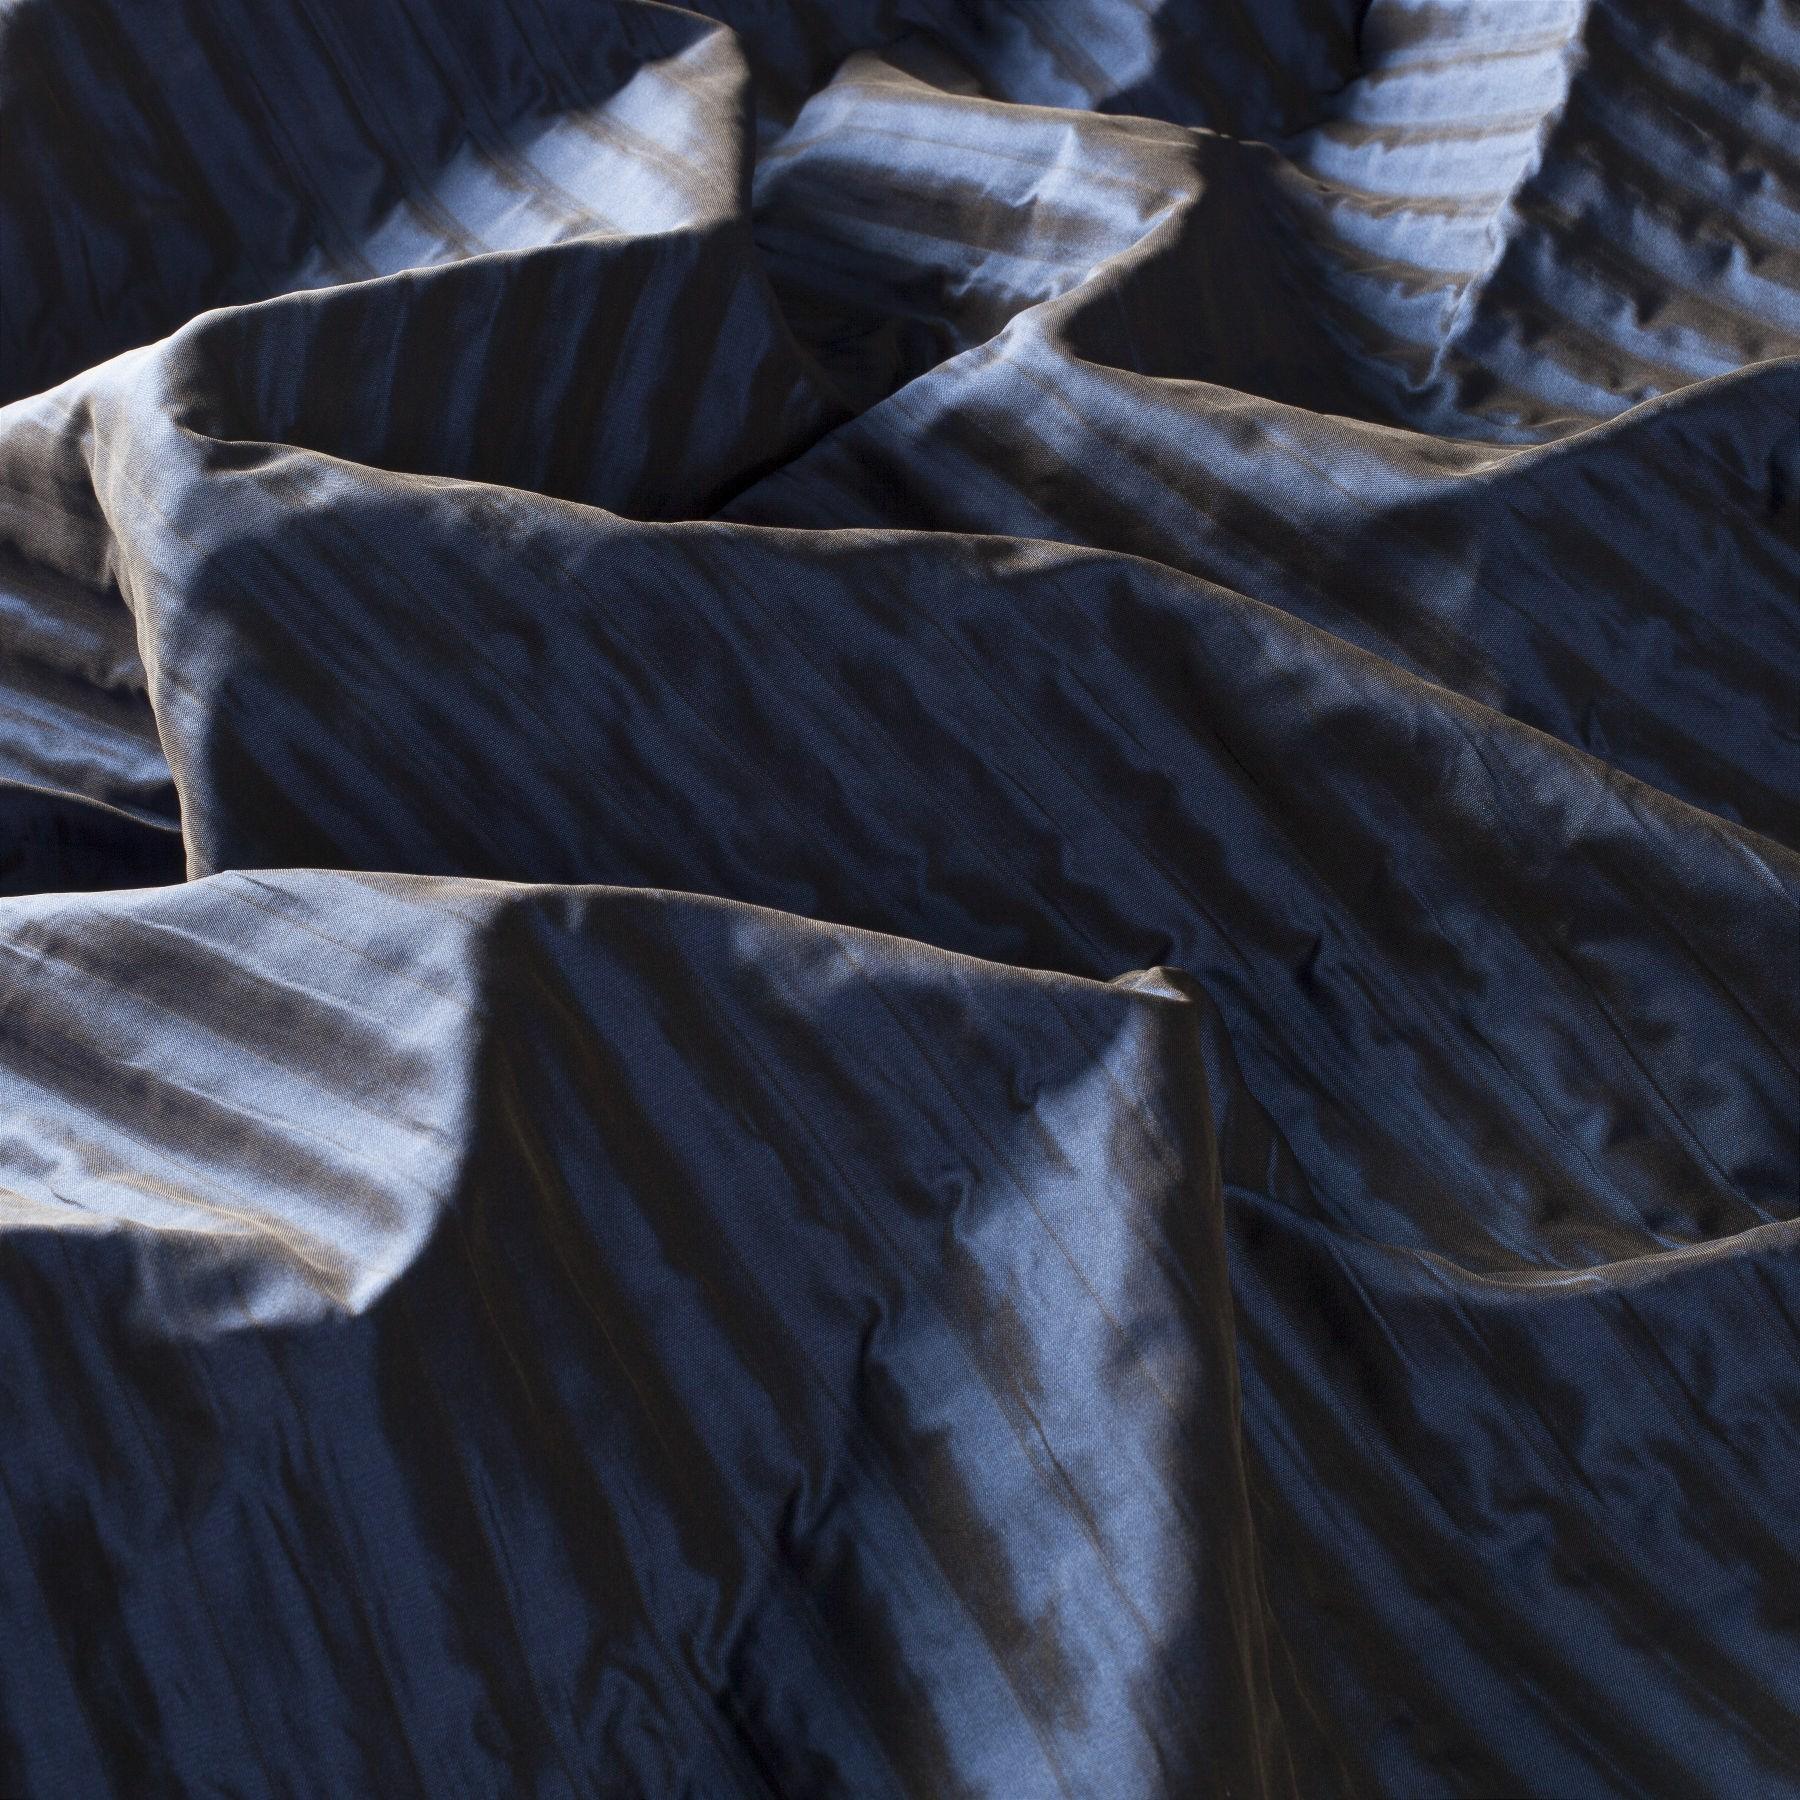 jive erato collection jab anstoetz group. Black Bedroom Furniture Sets. Home Design Ideas